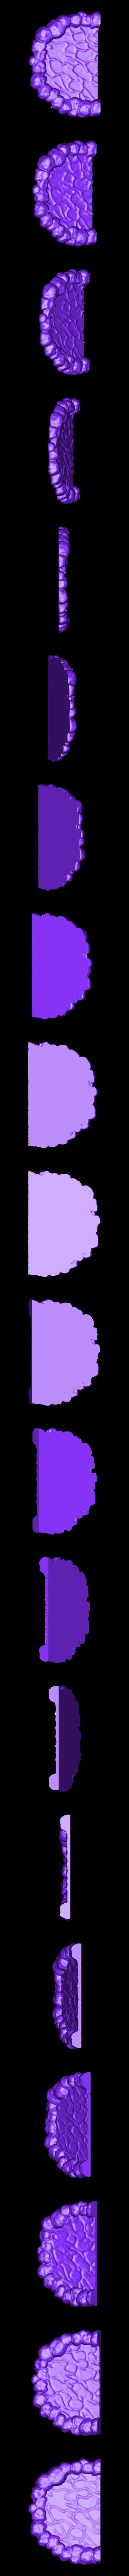 water_end.stl Download free STL file Modular River • 3D printer object, daandruff